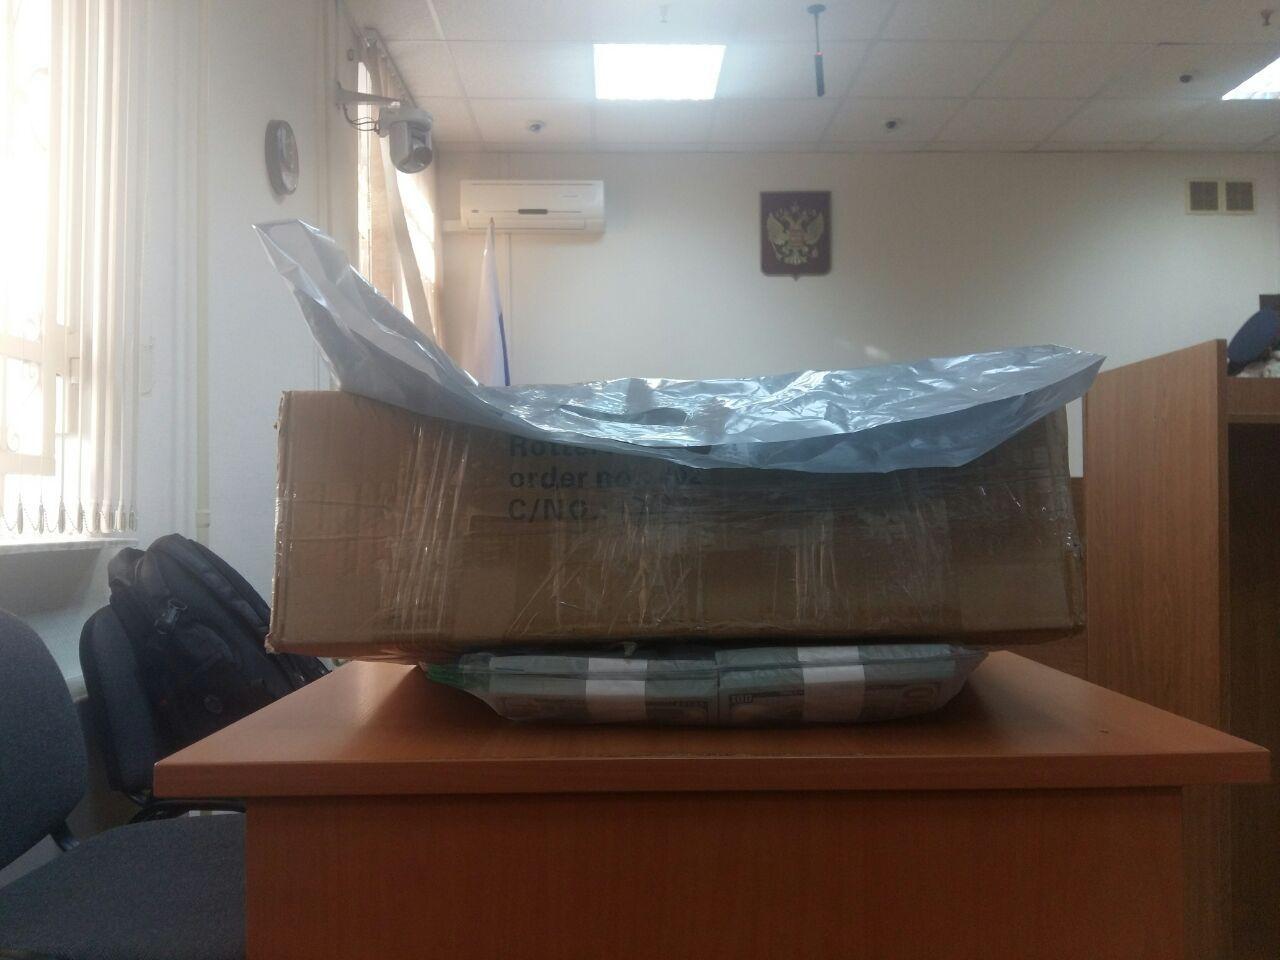 Юрист  Улюкаева: изуважения ксуду отказываемся отдопроса Сечина